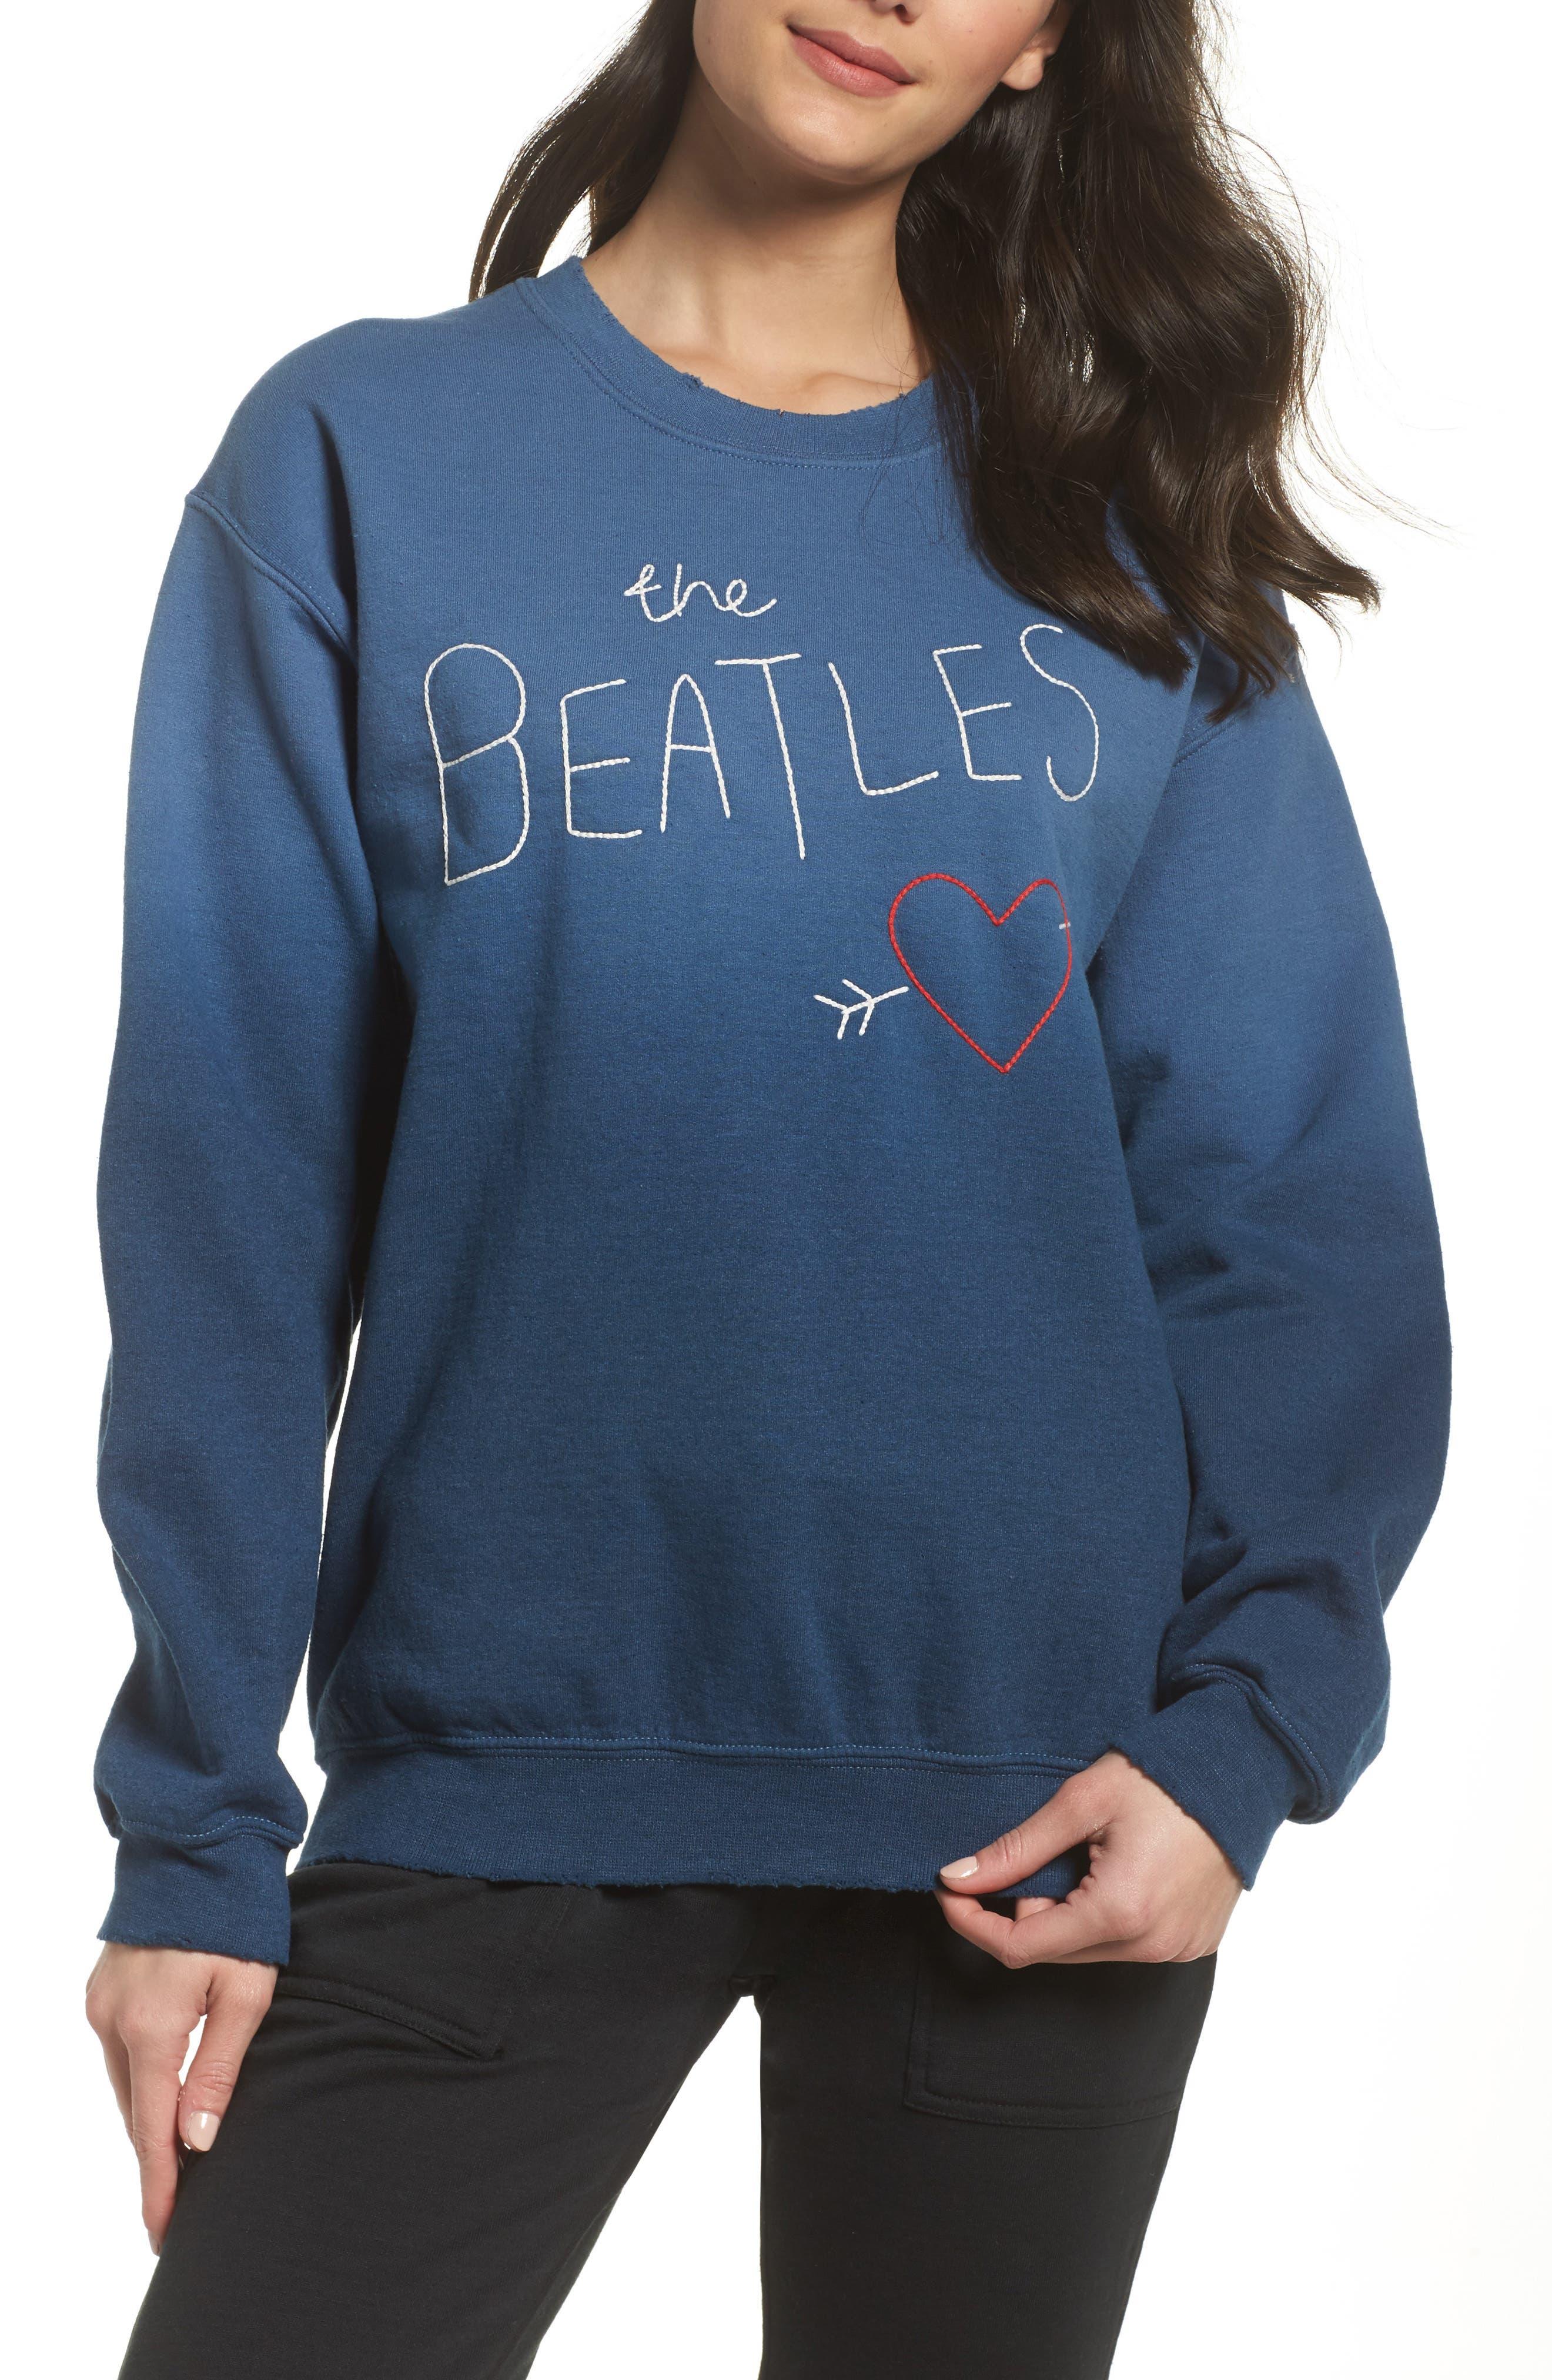 Alternate Image 1 Selected - Junk Food The Beatles Ombré Sweatshirt (Nordstrom Exclusive)